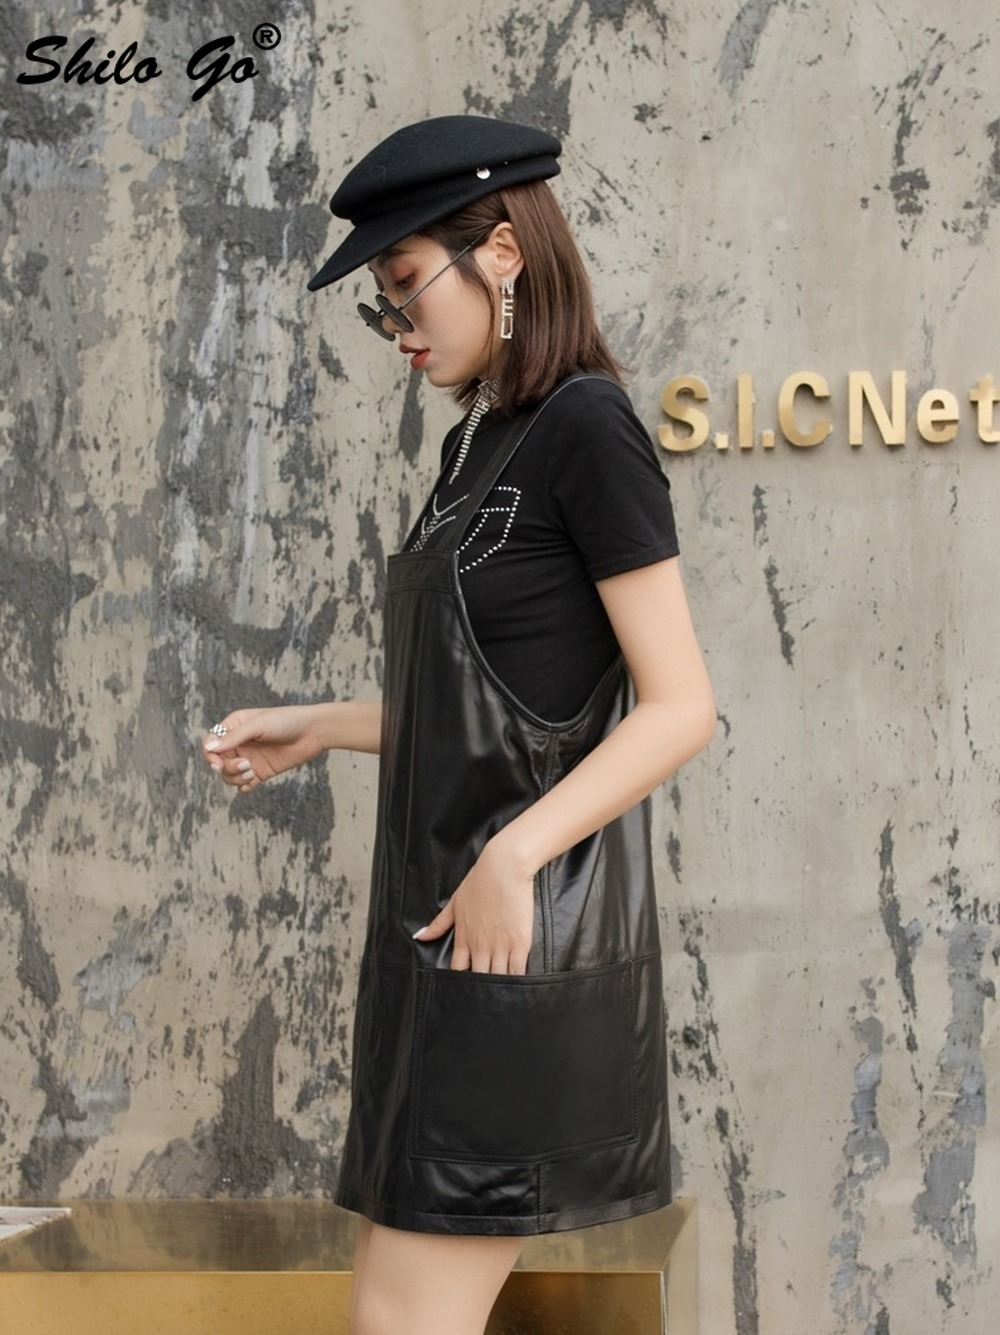 Genuine Leather Dress Black Solid Sleeveless Strap Dress Women Autumn Casual Plus Size Pocket Front Backless Sheepskin Dresses - 4